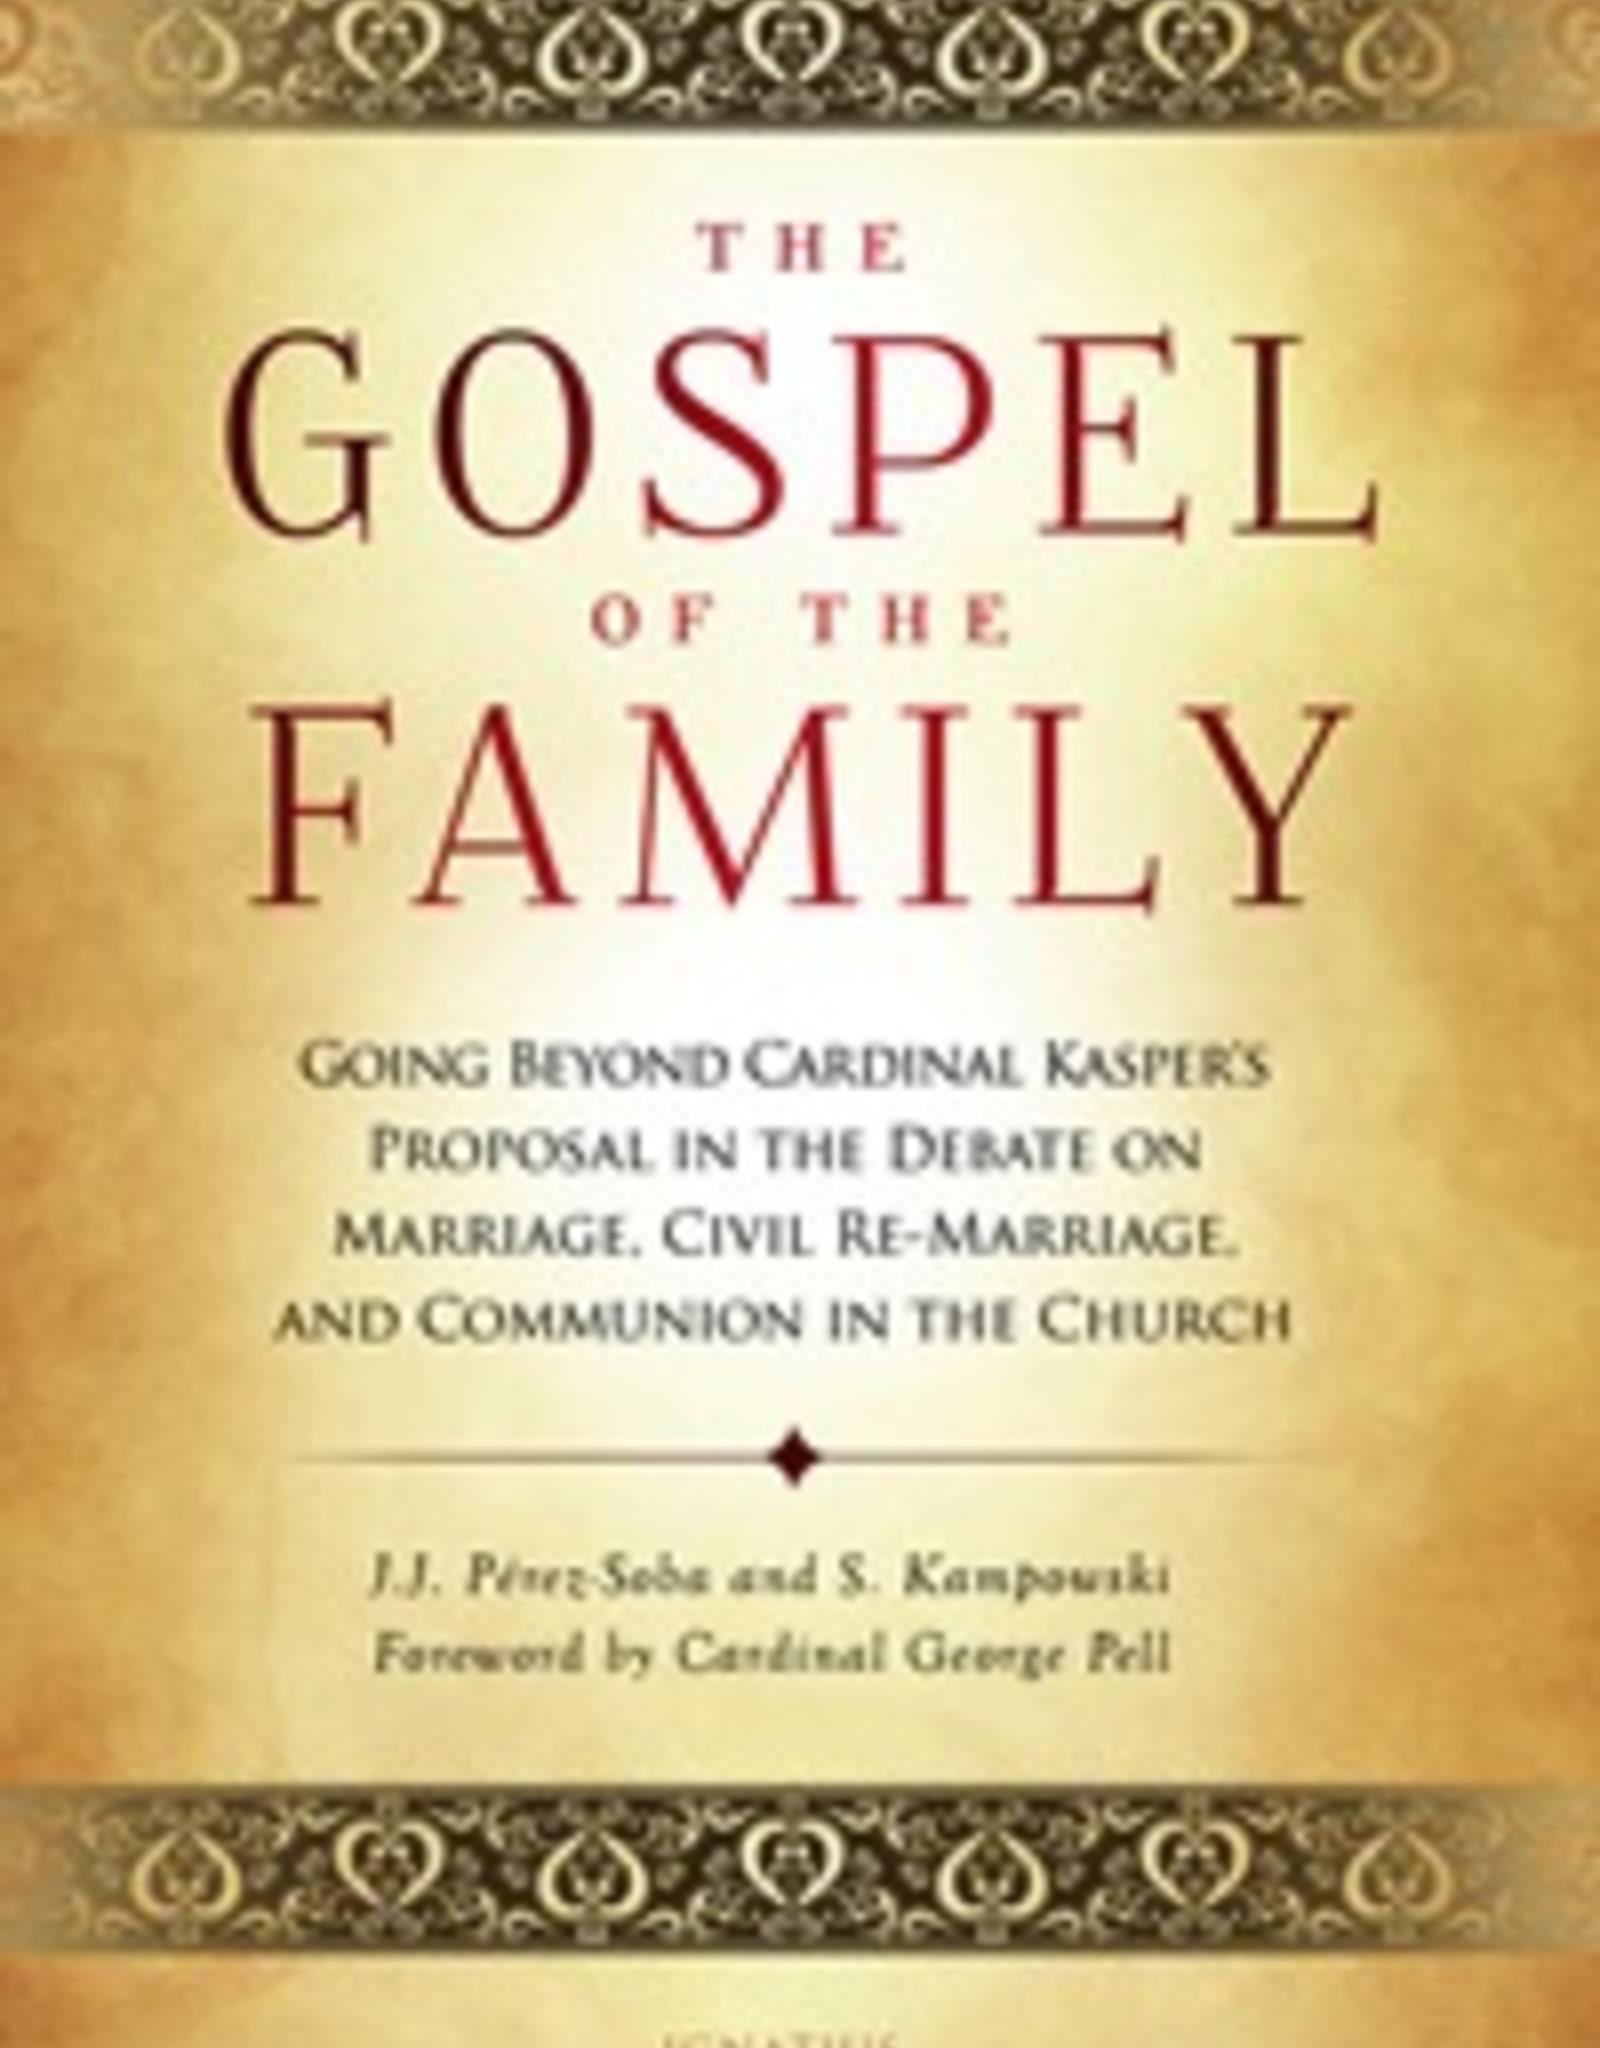 Ignatius Press The Gospel of the Family, by Stephan Kampowski and Juan Perez-Soba (paperback)